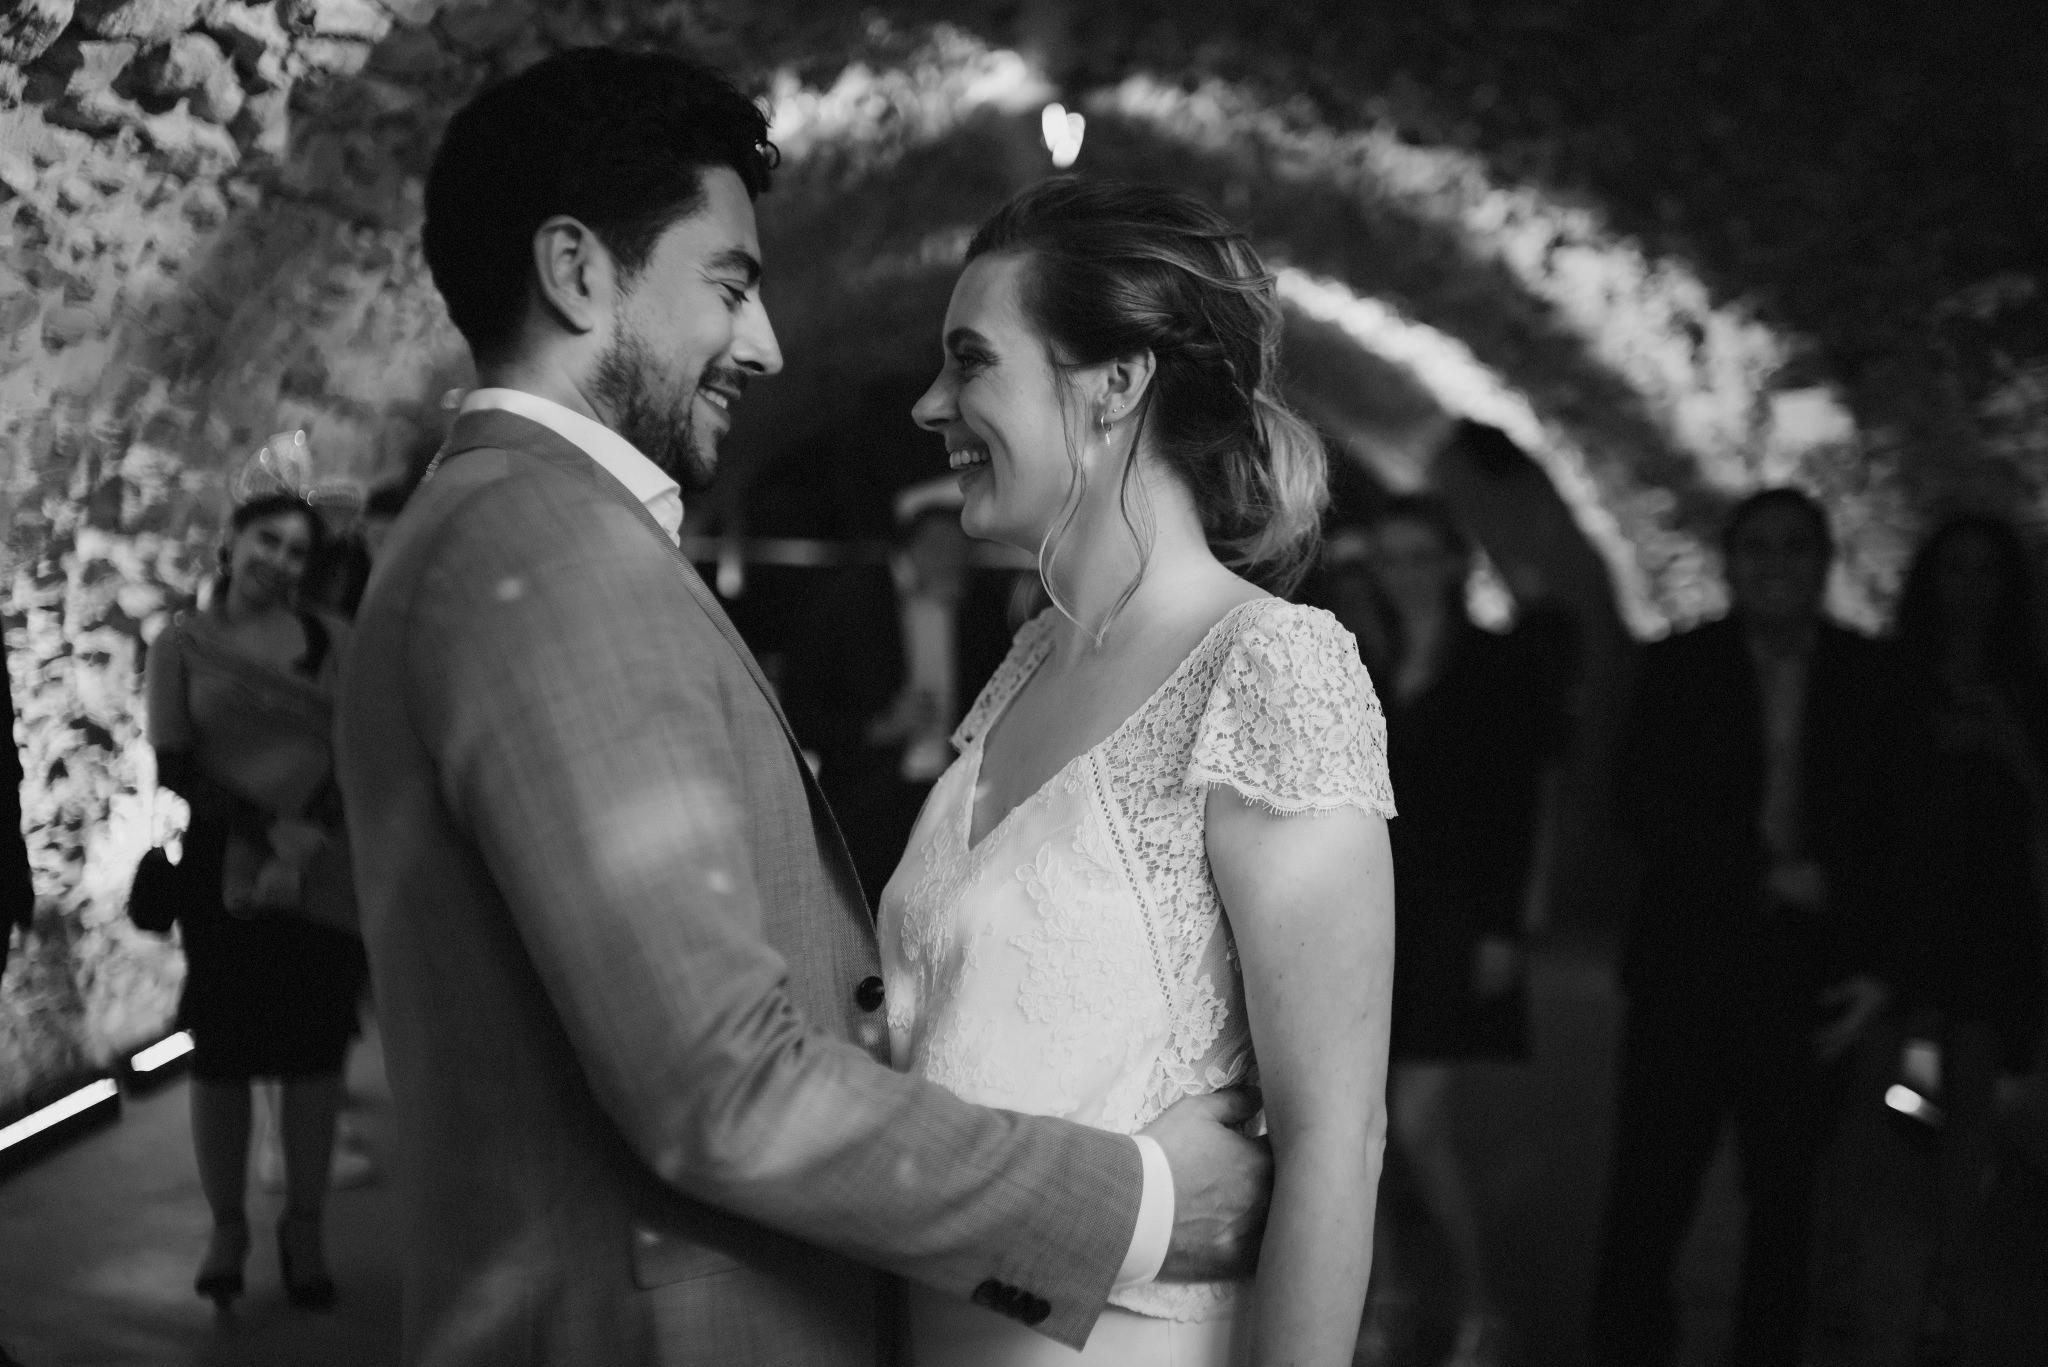 Bruidsfotograaf Spanje Castle d'Emporda destination wedding Naomi van der Kraan00076.jpg